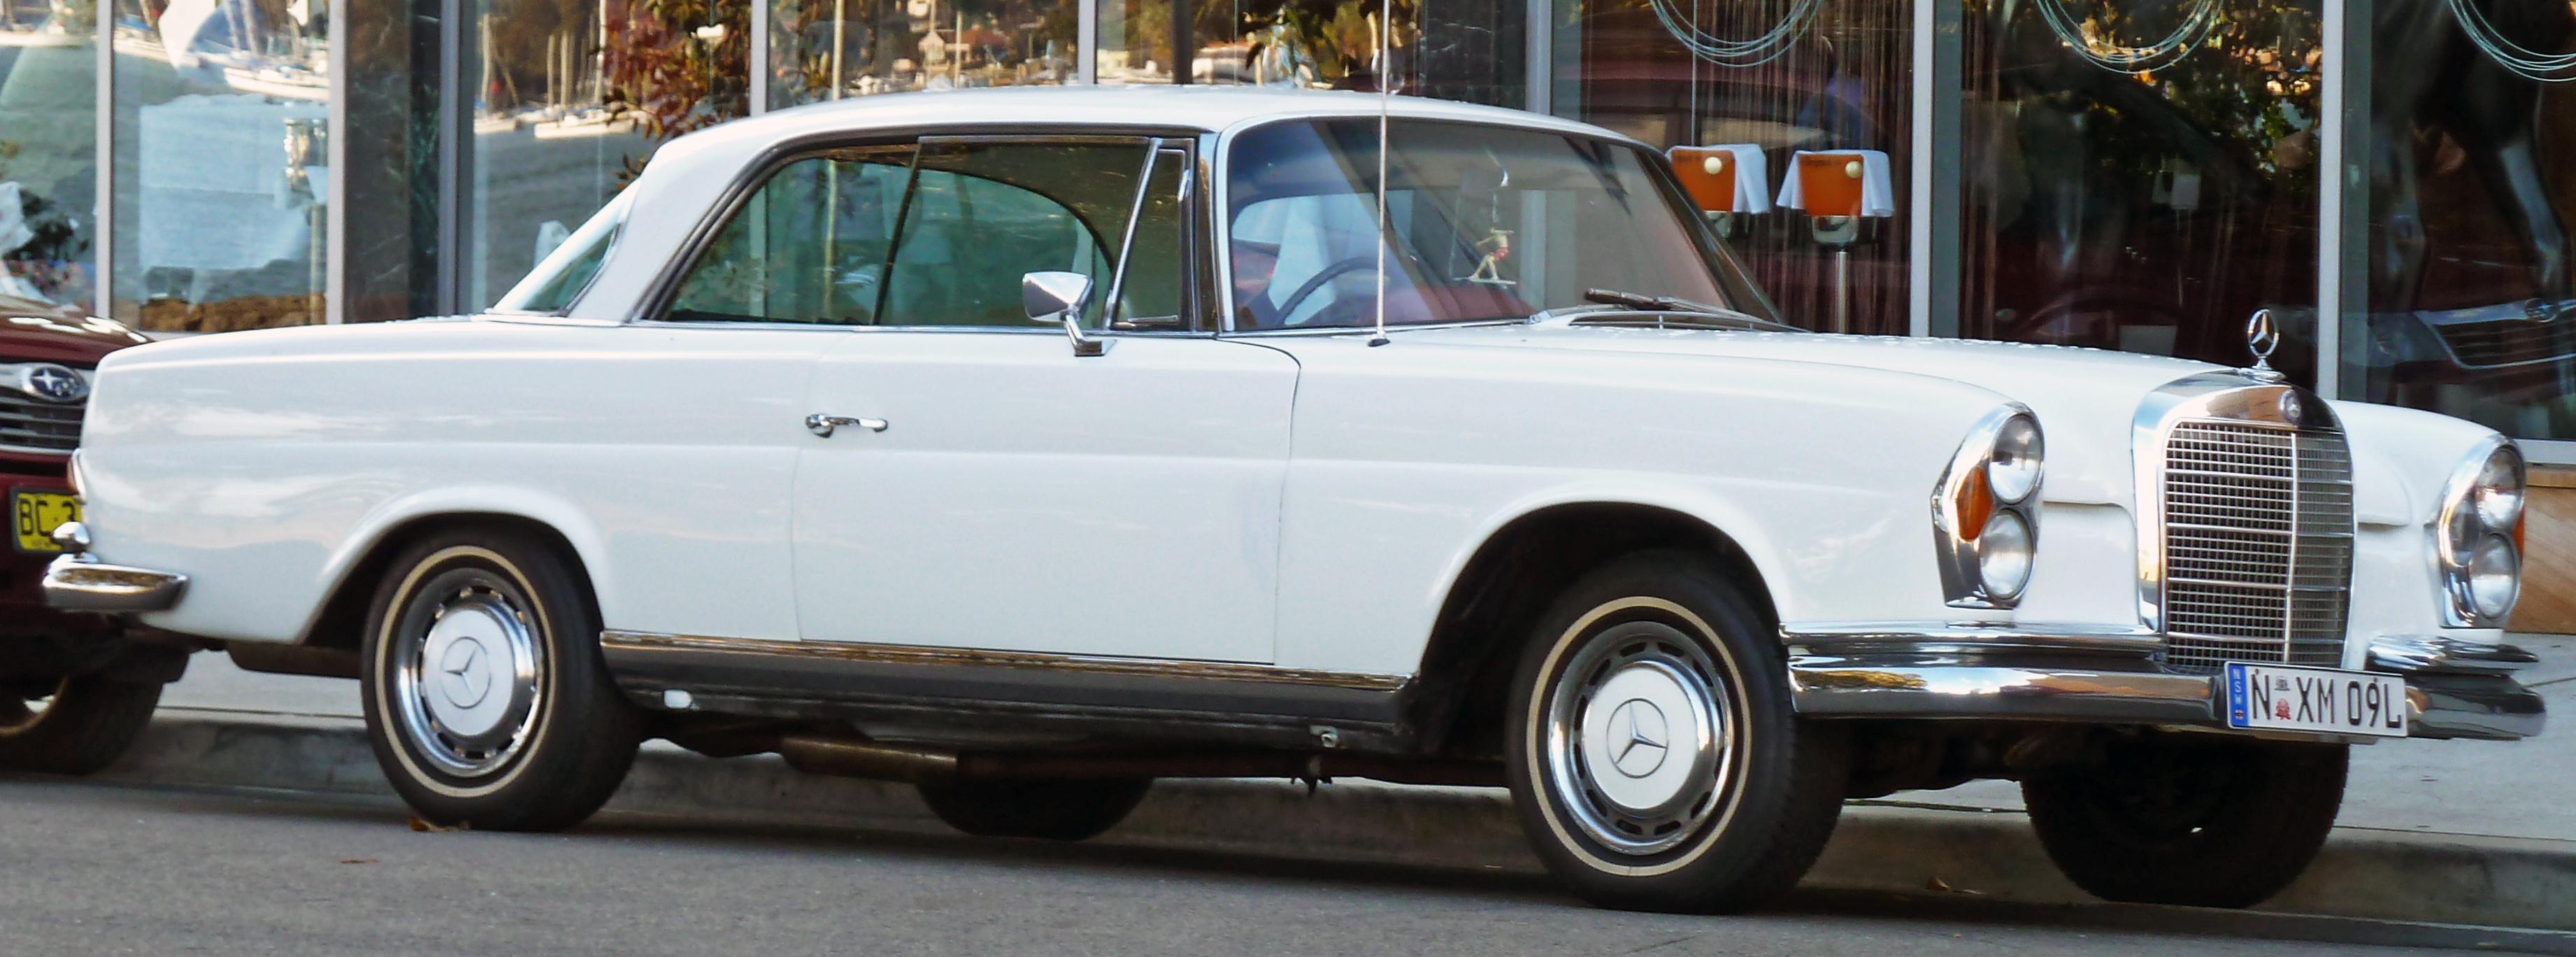 1968 mercedes w111 partsopen for 1968 mercedes benz